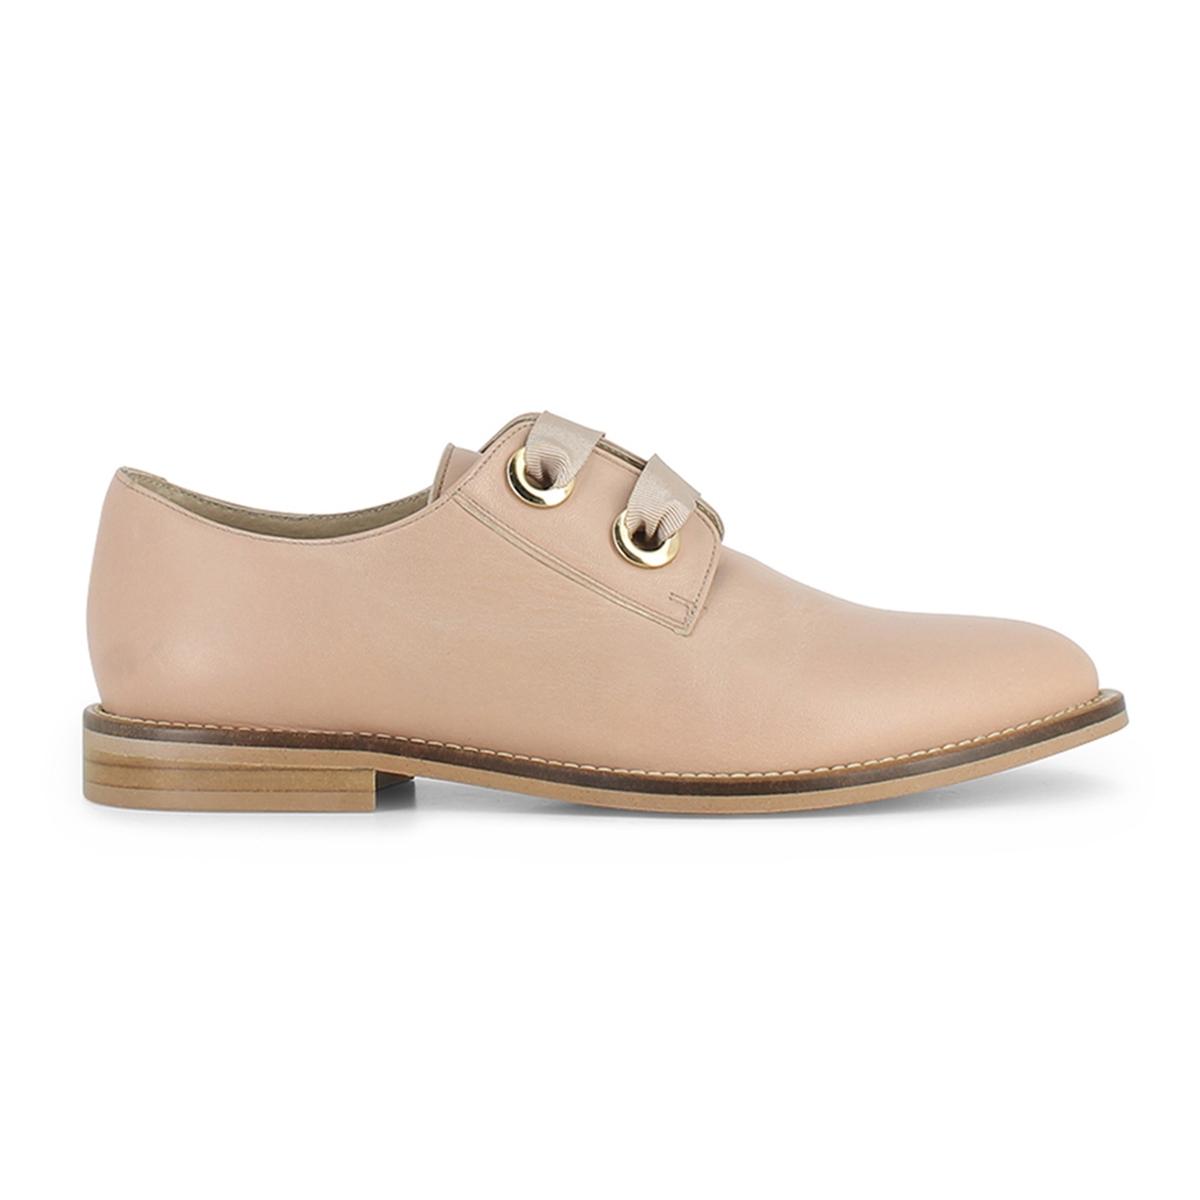 Ботинки-дерби DELI из кожи ботинки дерби из мягкой кожи takarika